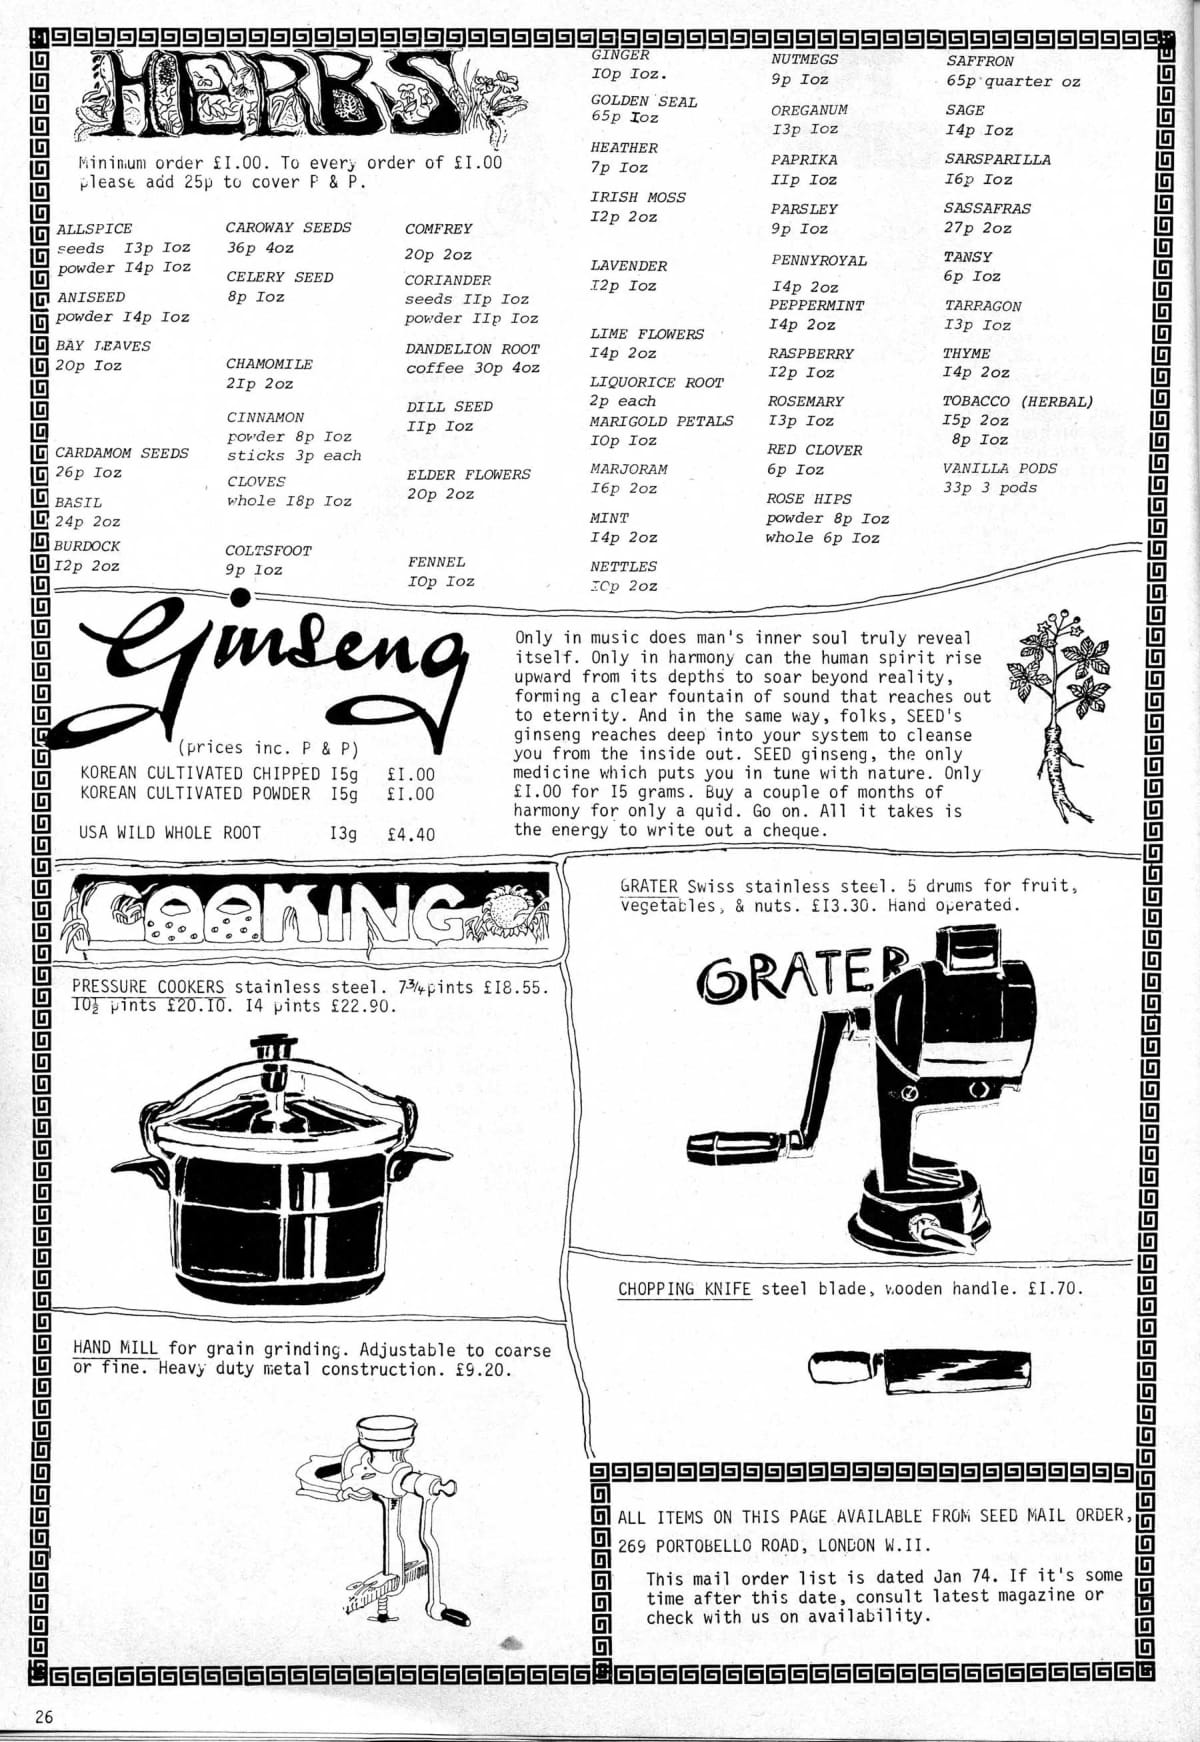 seed-v3-n1-jan1974-26.jpg